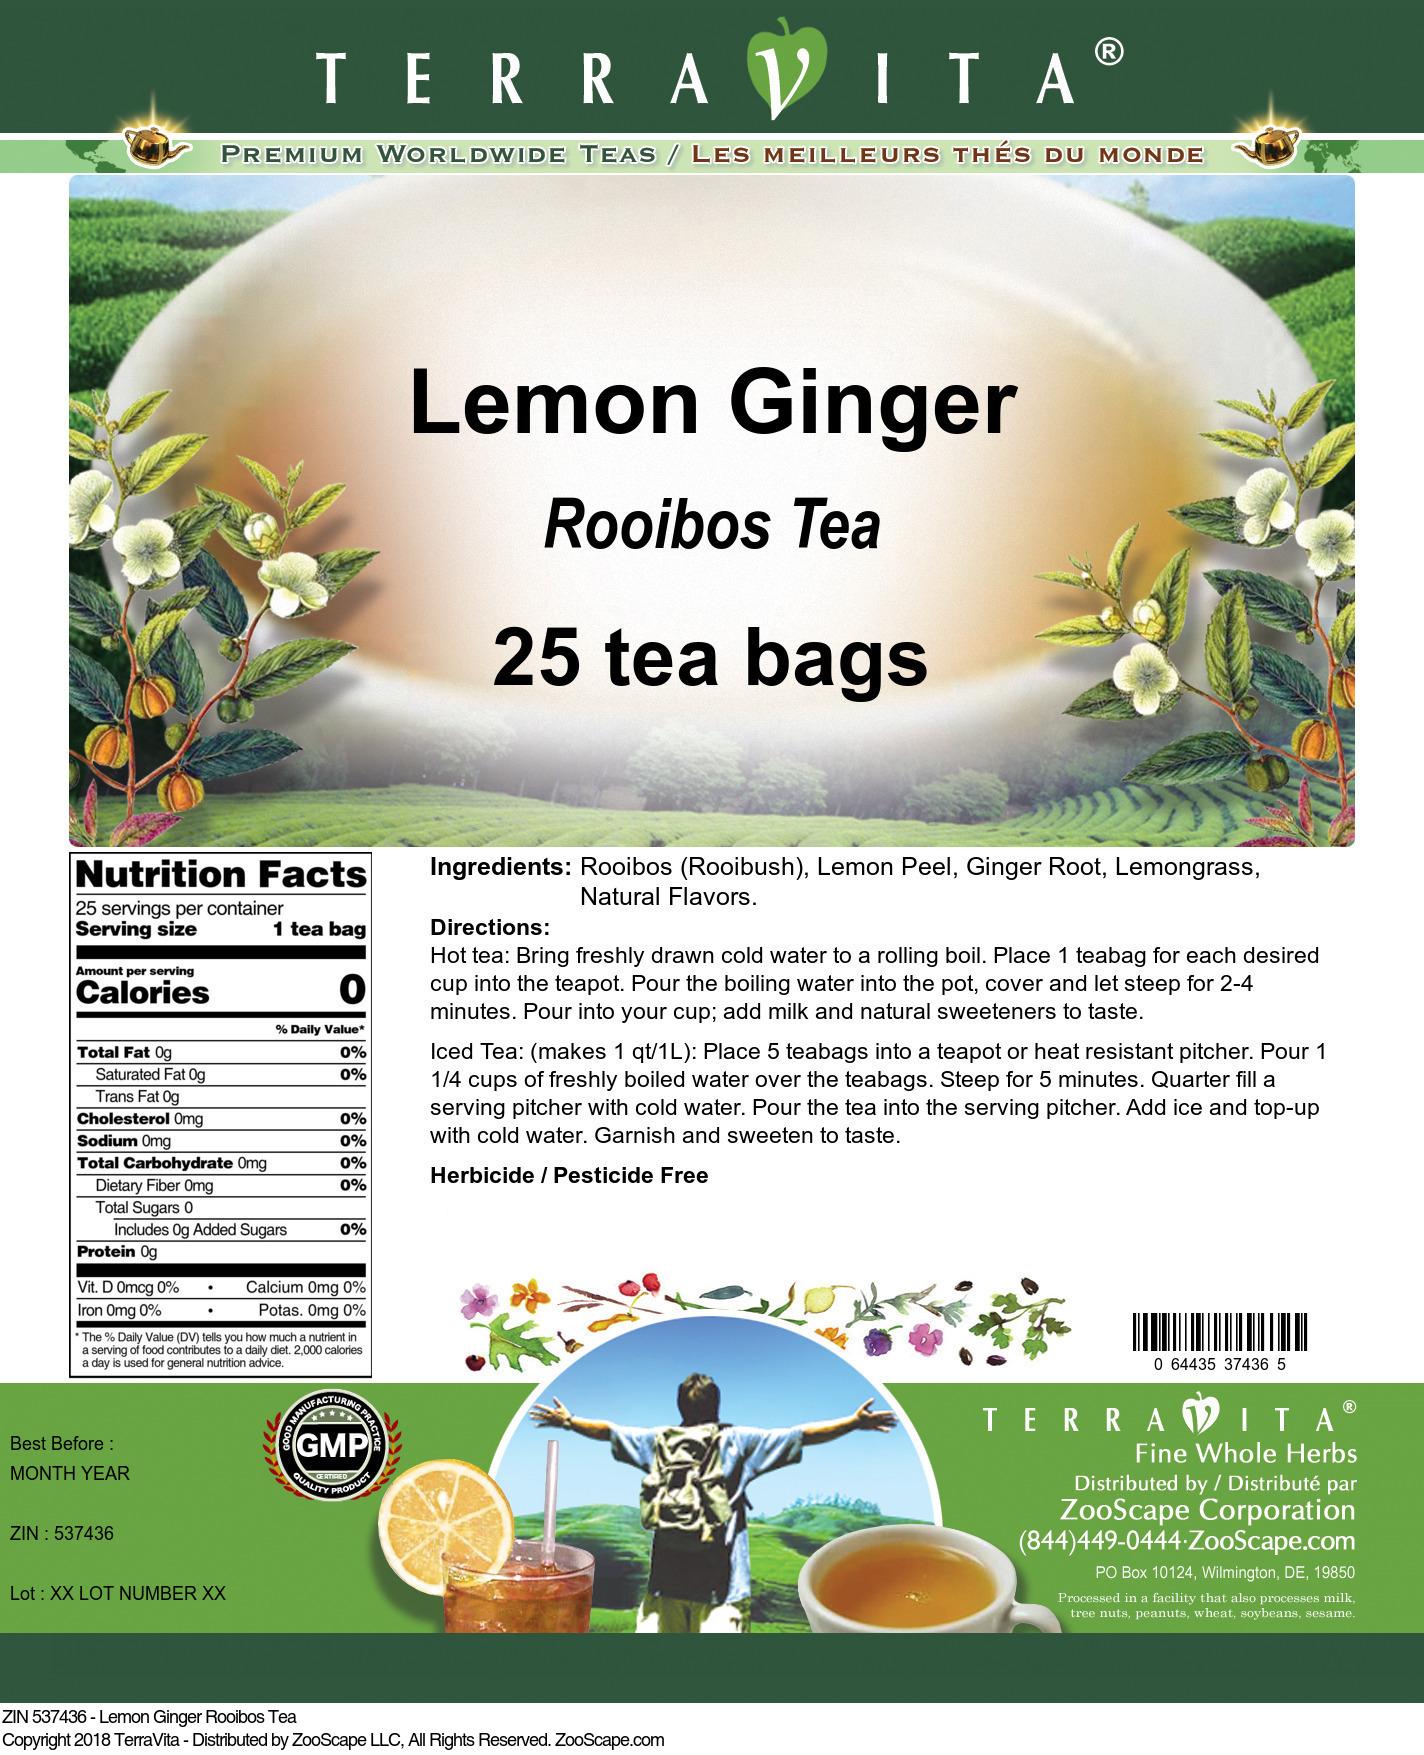 Lemon Ginger Rooibos Tea